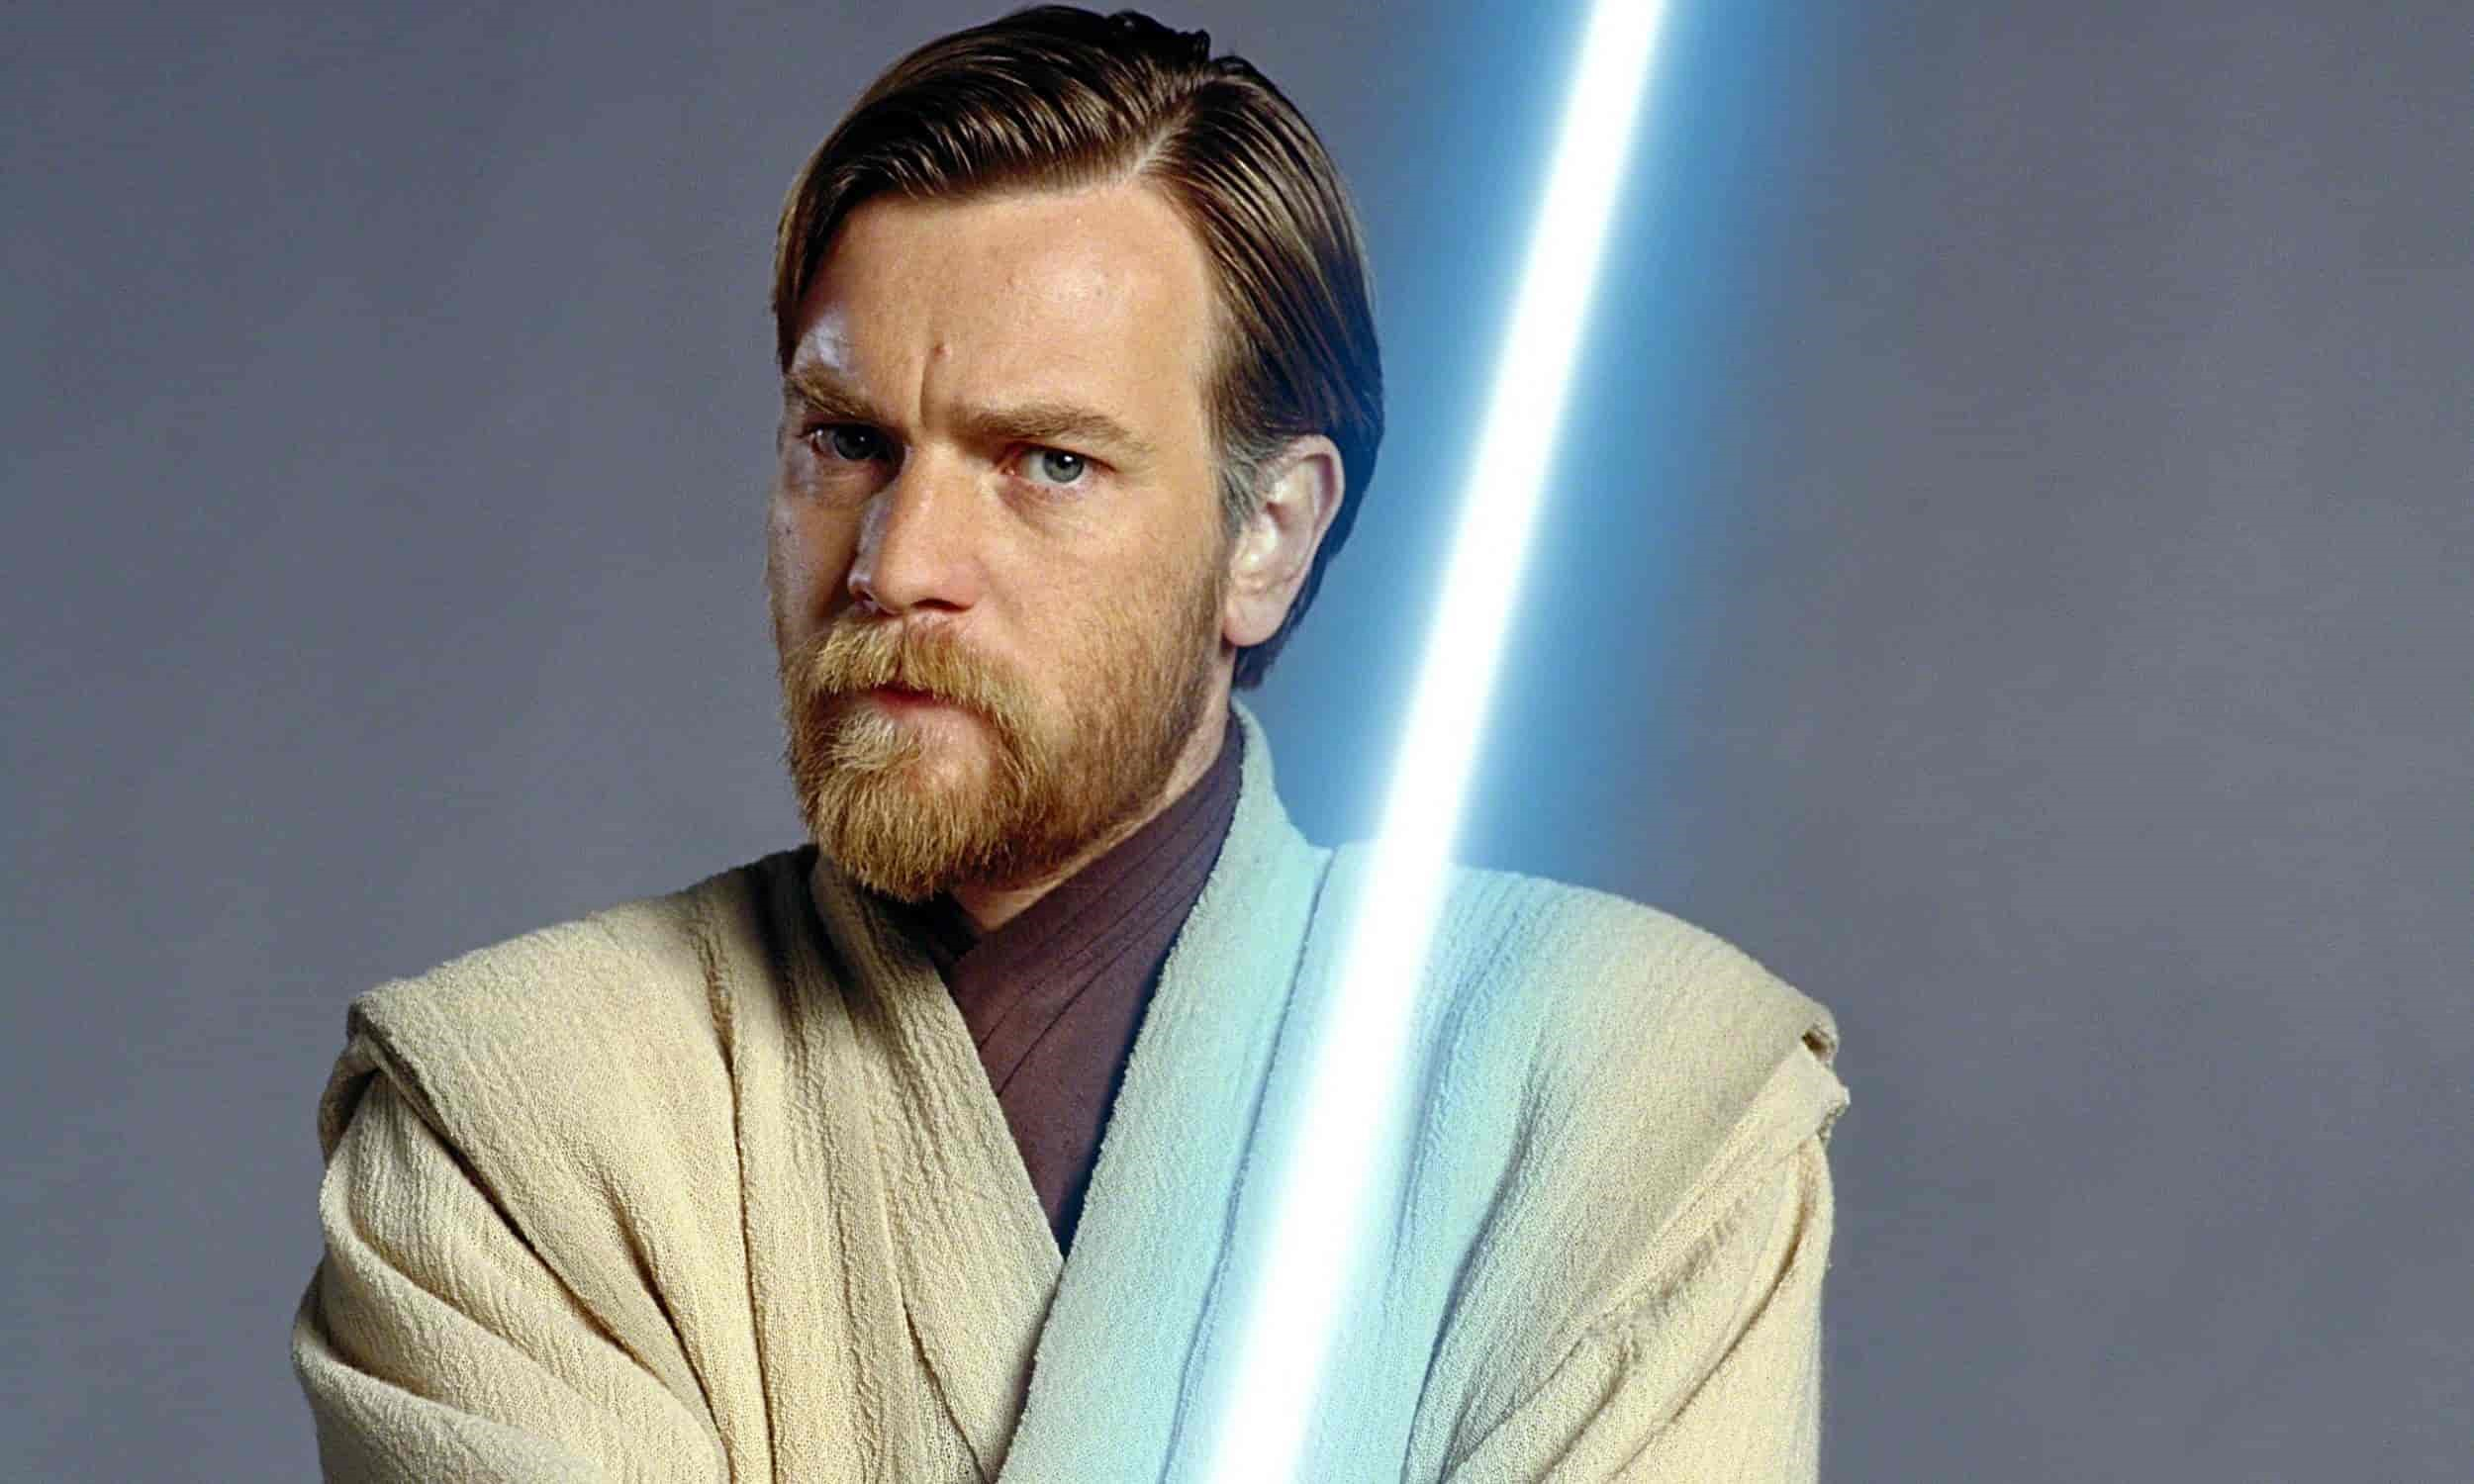 Här kan du se Ewan McGregor som Obi-Wan Kenobi